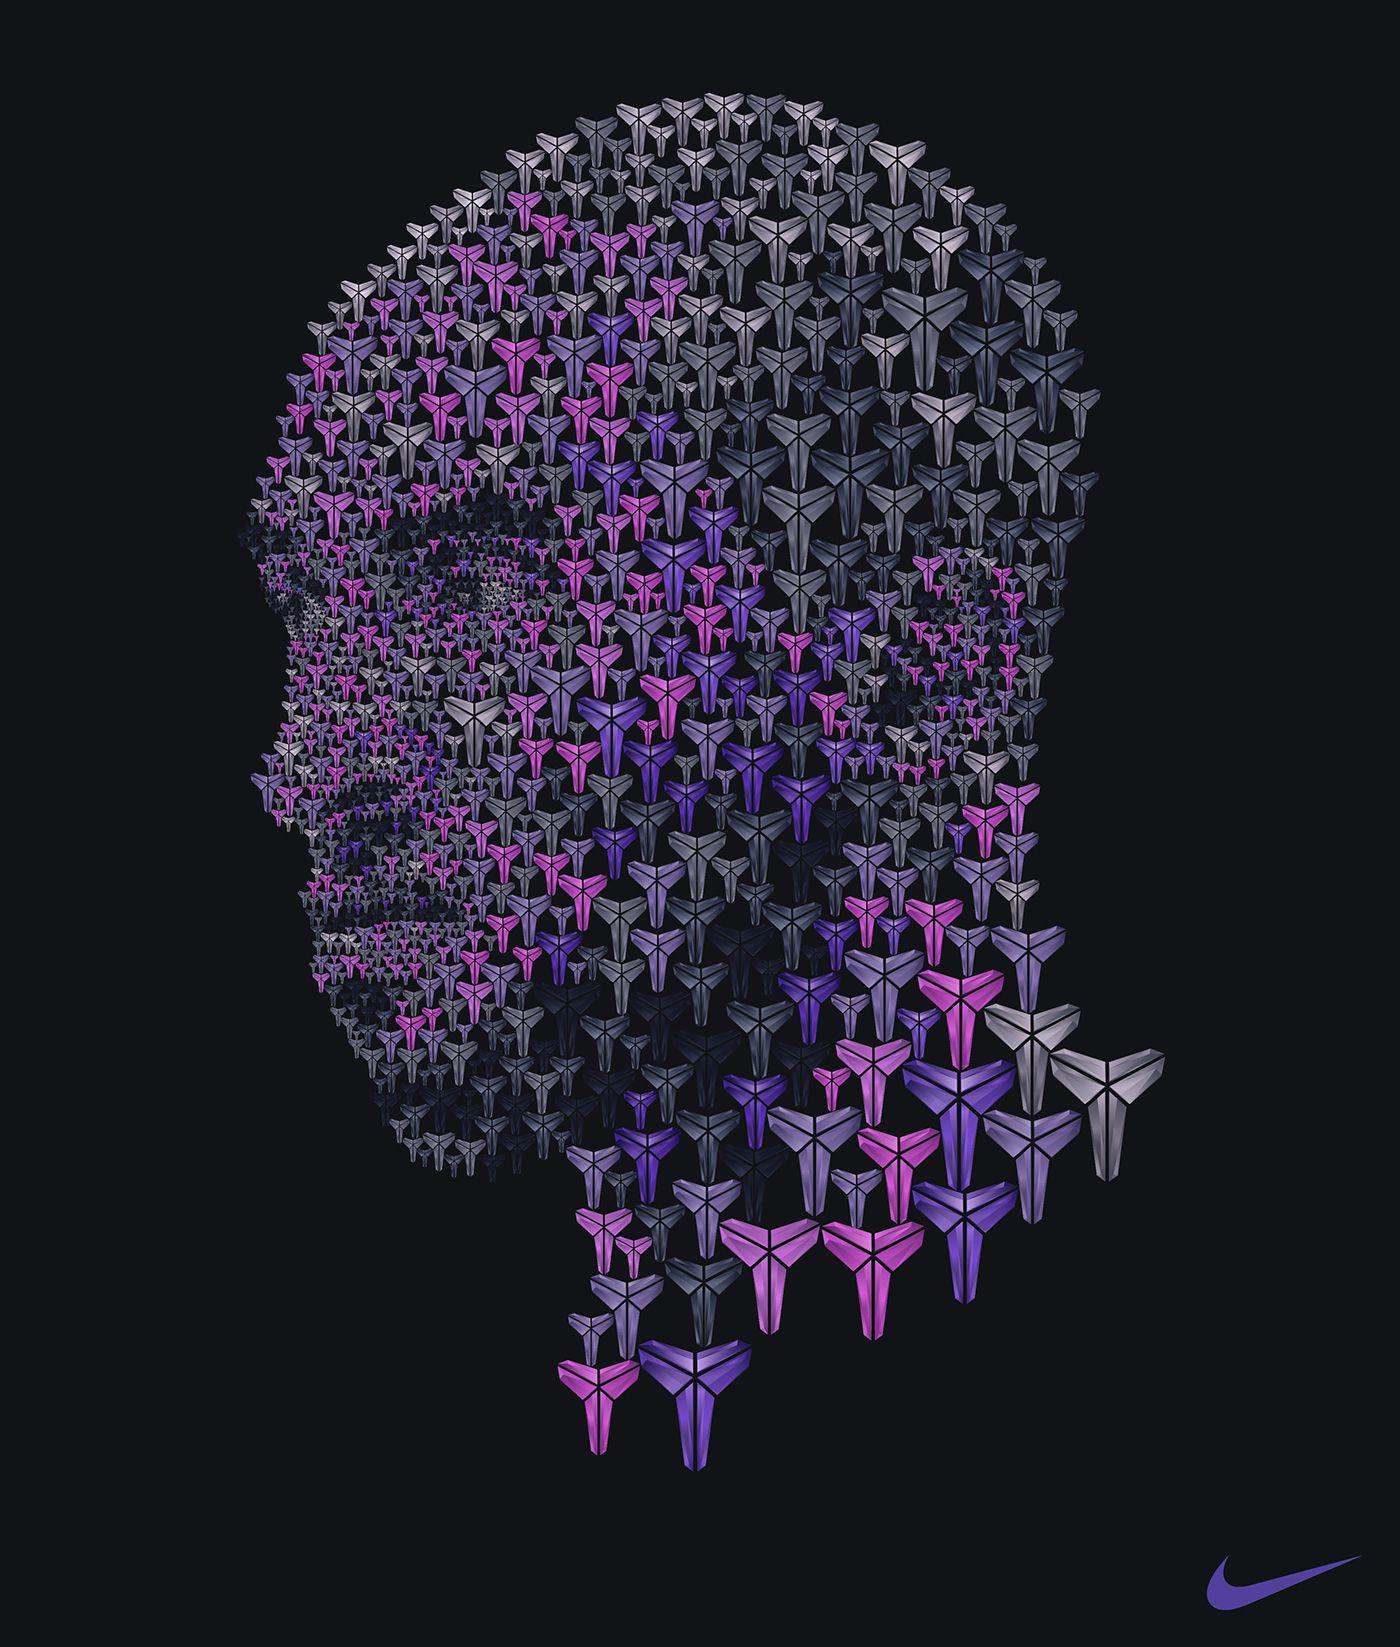 Conceptual portrait by artist Ziarekenya Smith using a